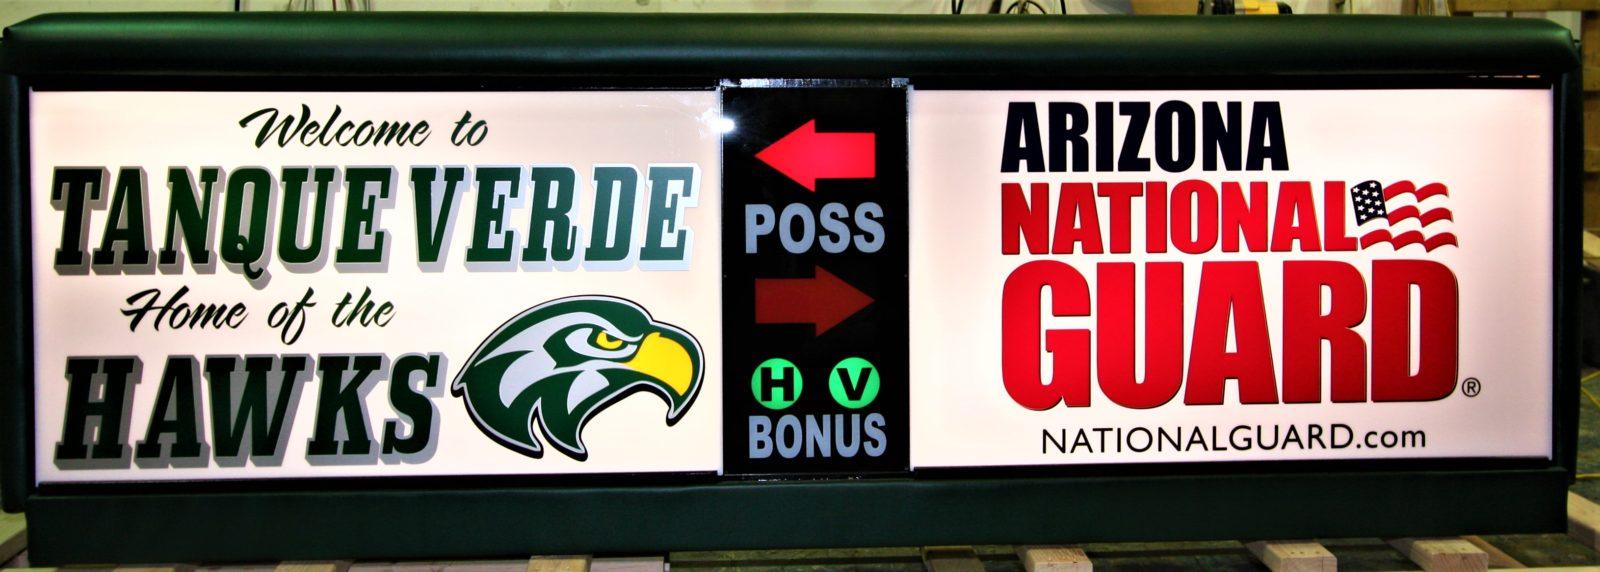 Tanque Verde high school Arizona Army National Guard AZARNG